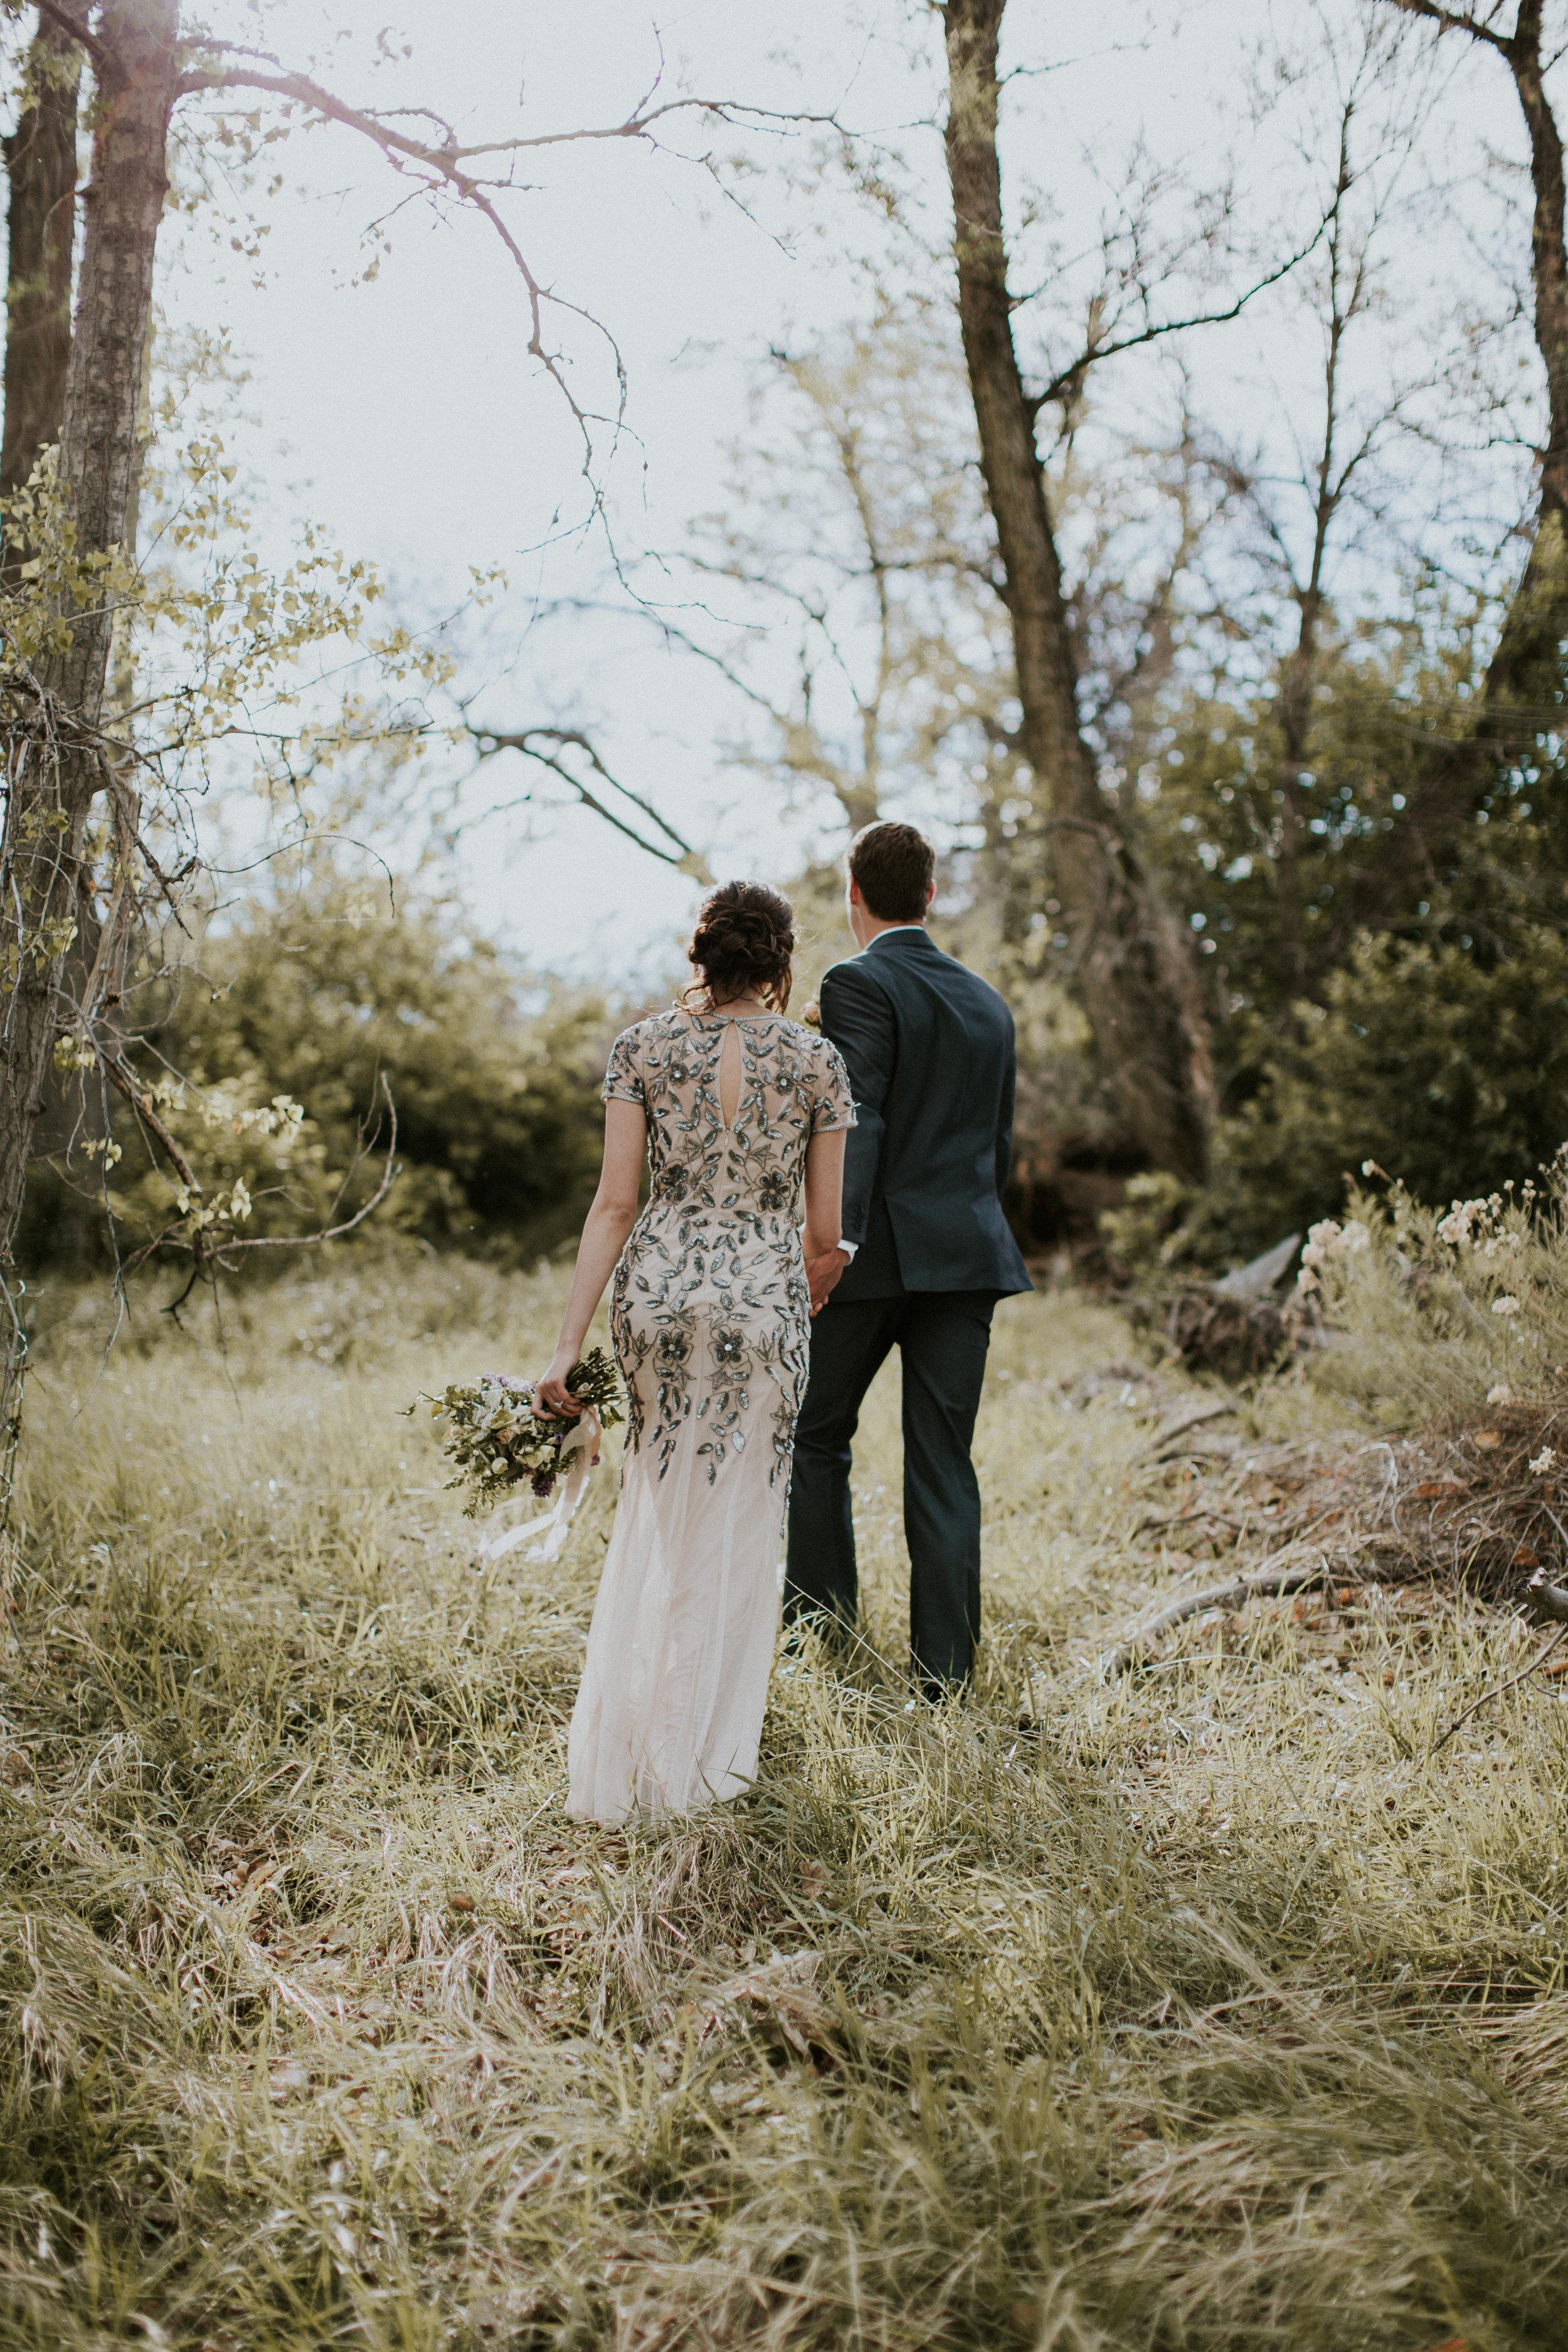 Denver-wedding-hairstylist-messy-wedding-updo